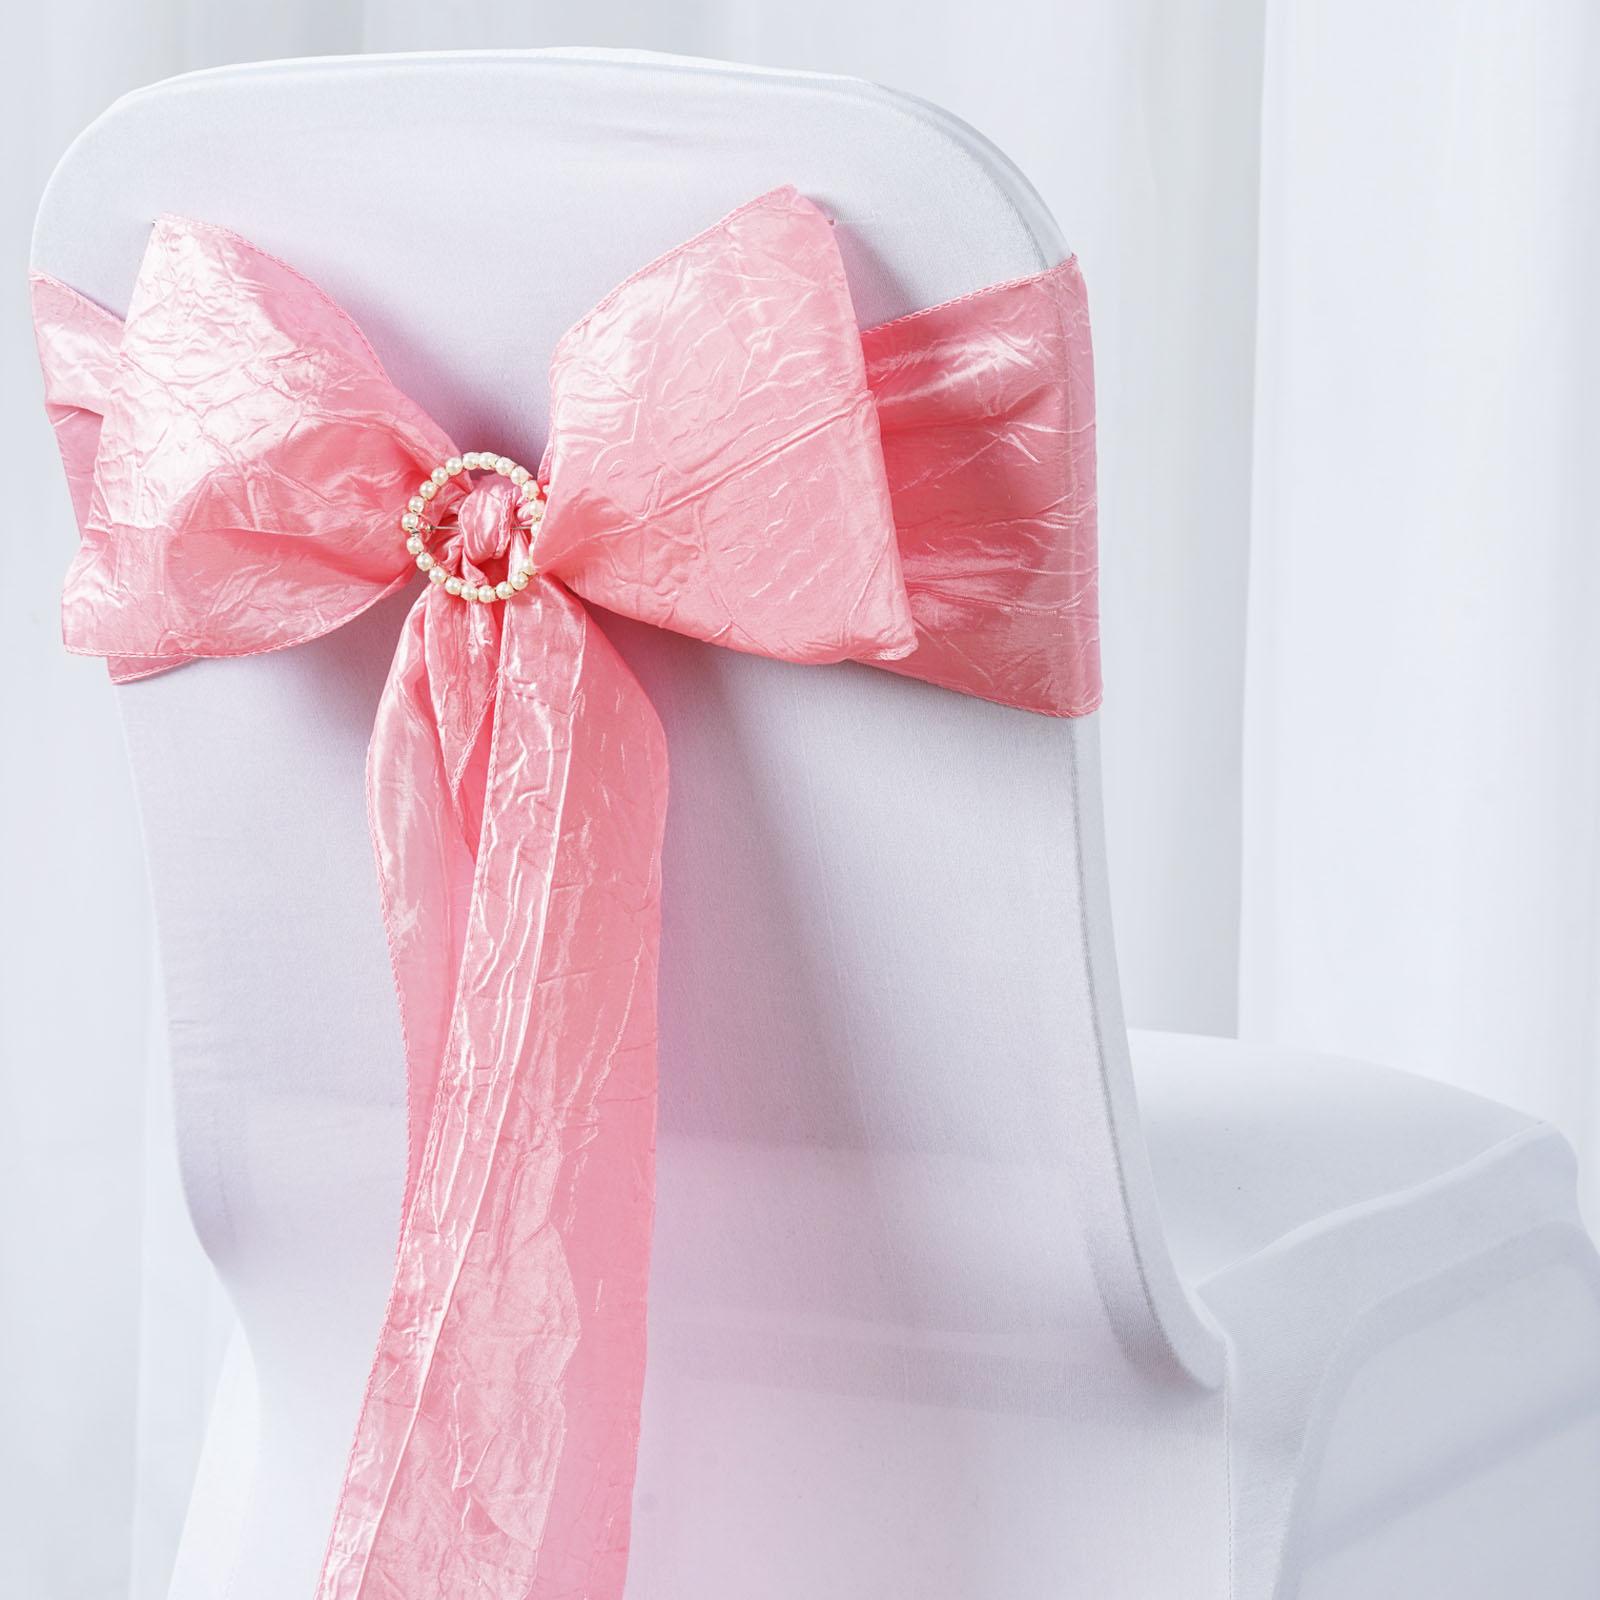 Taffeta Crinkle CHAIR SASHES Bows Ties Wedding Reception Decorations Wholesale